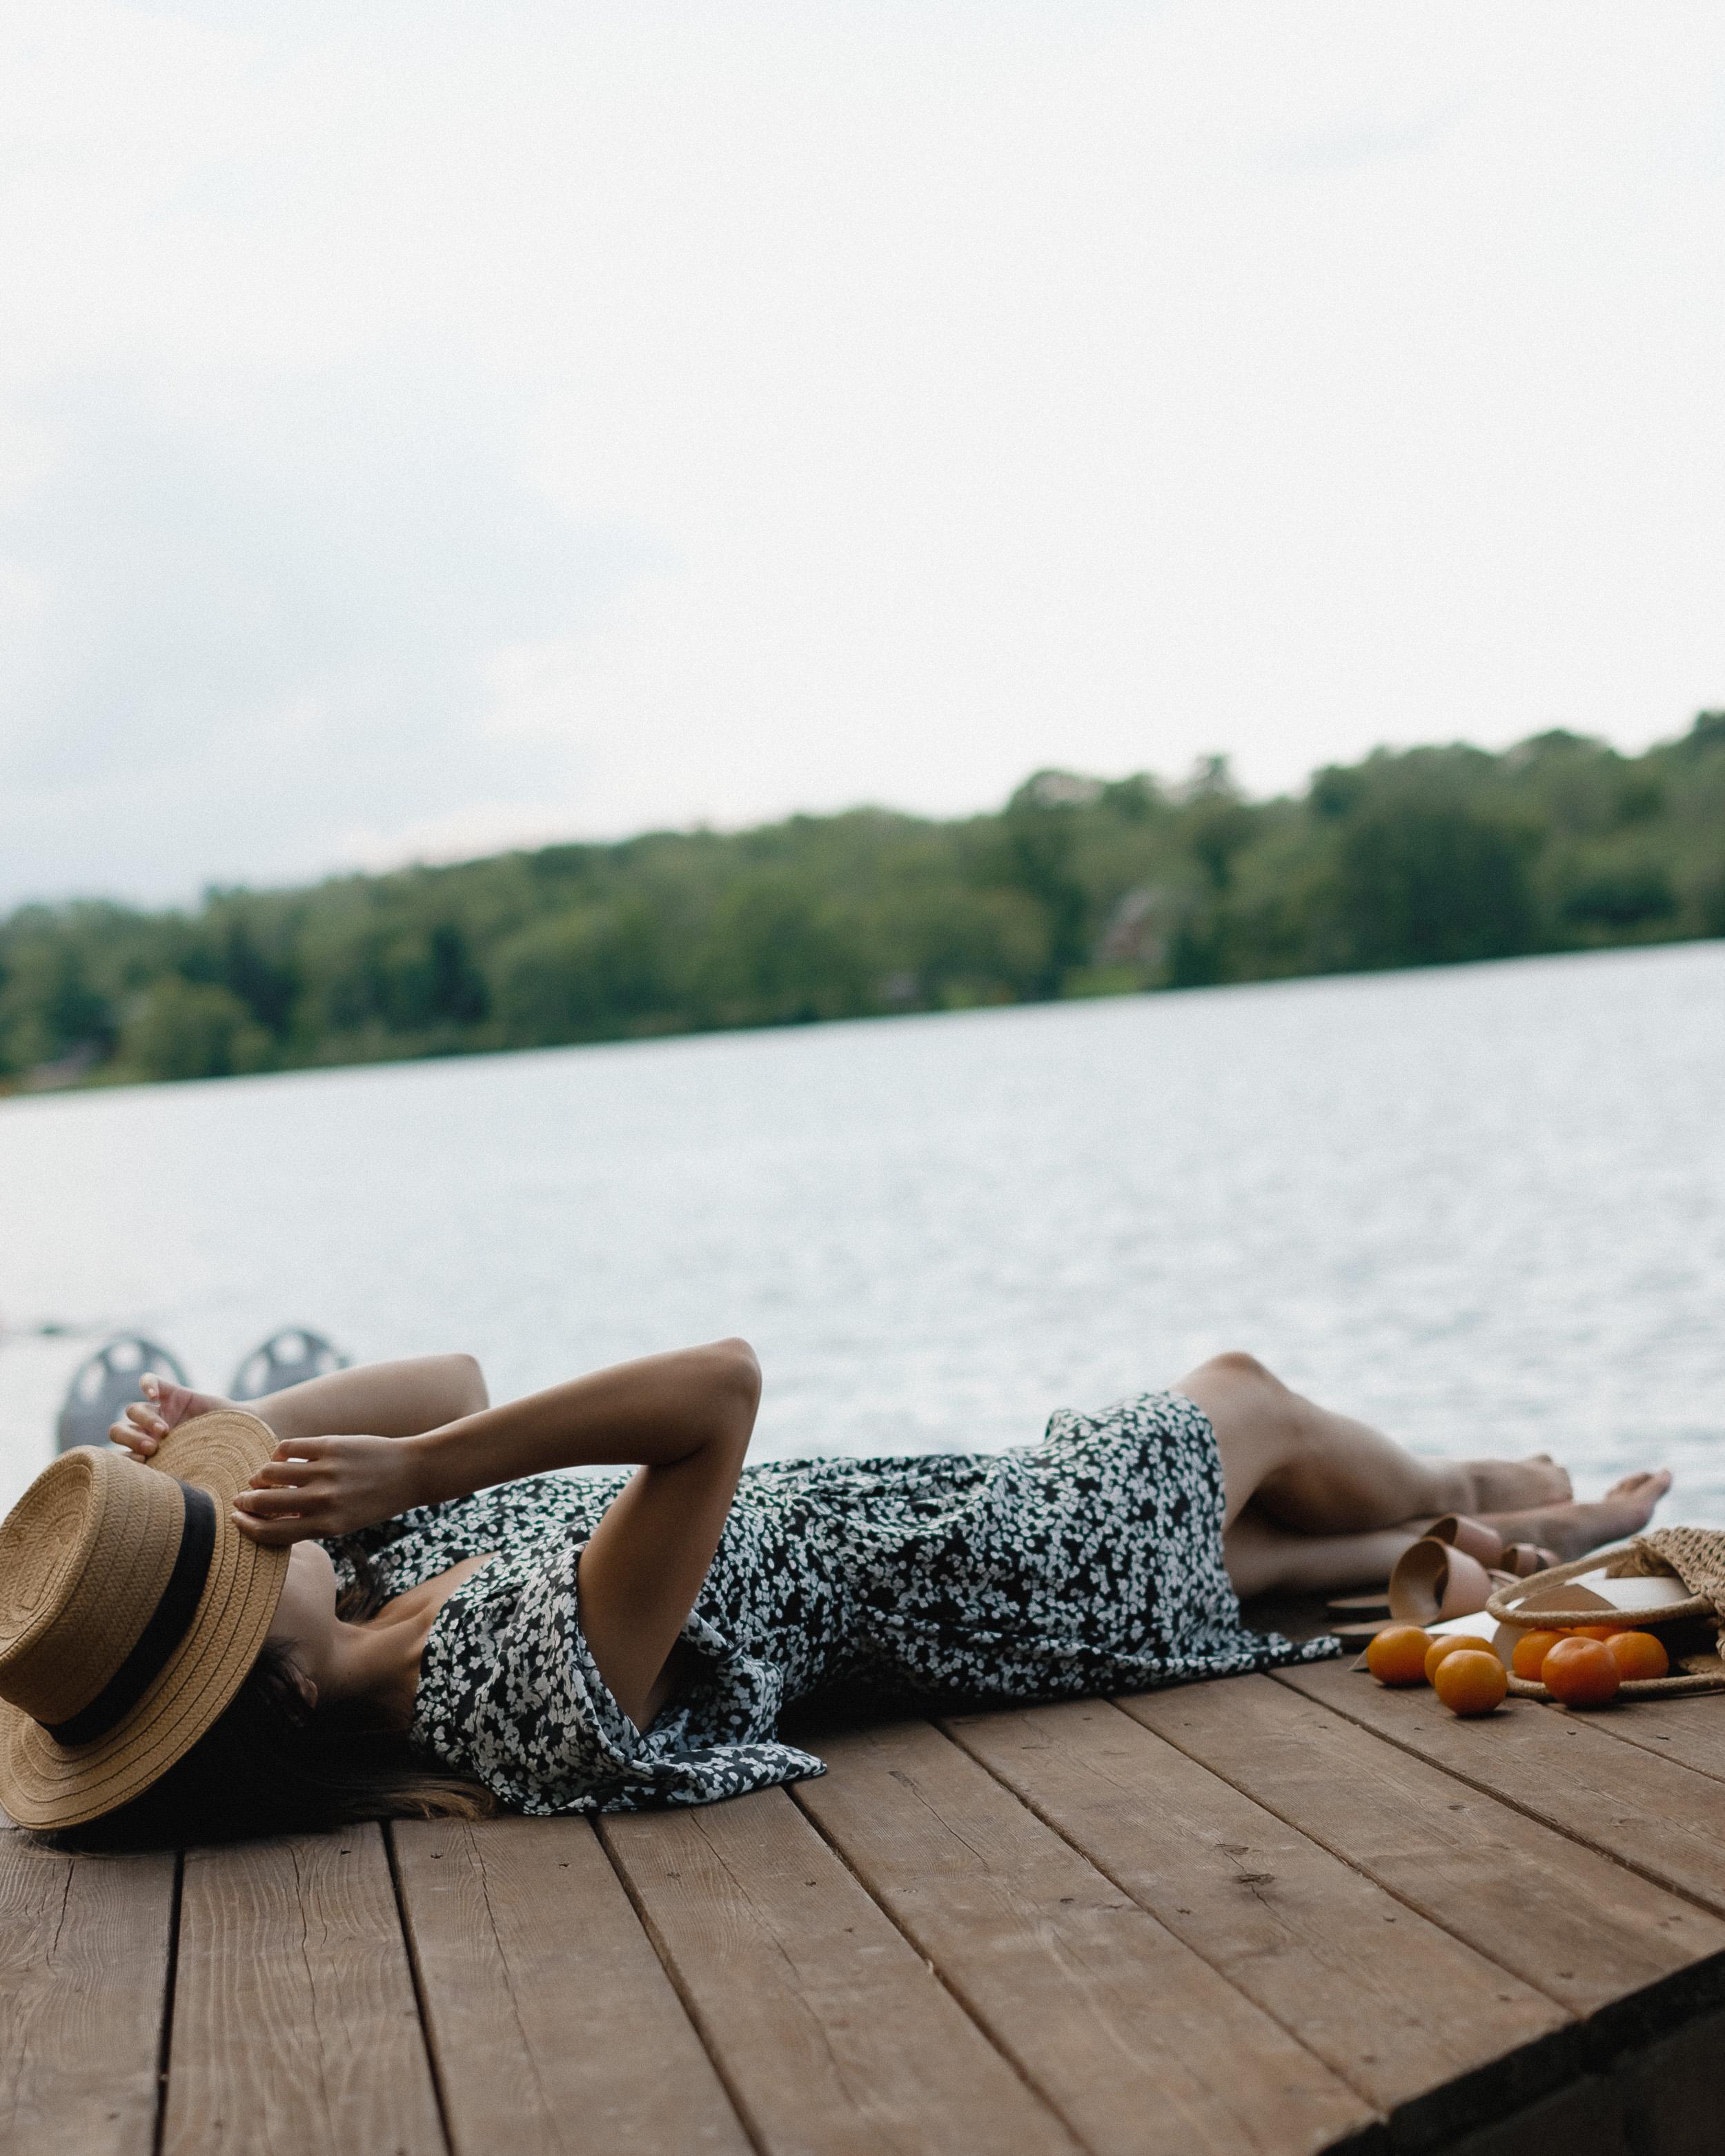 Wearing: dress from  Sylvie & Shimmy  (similar below), hat from Nordstrom (old, similar below)